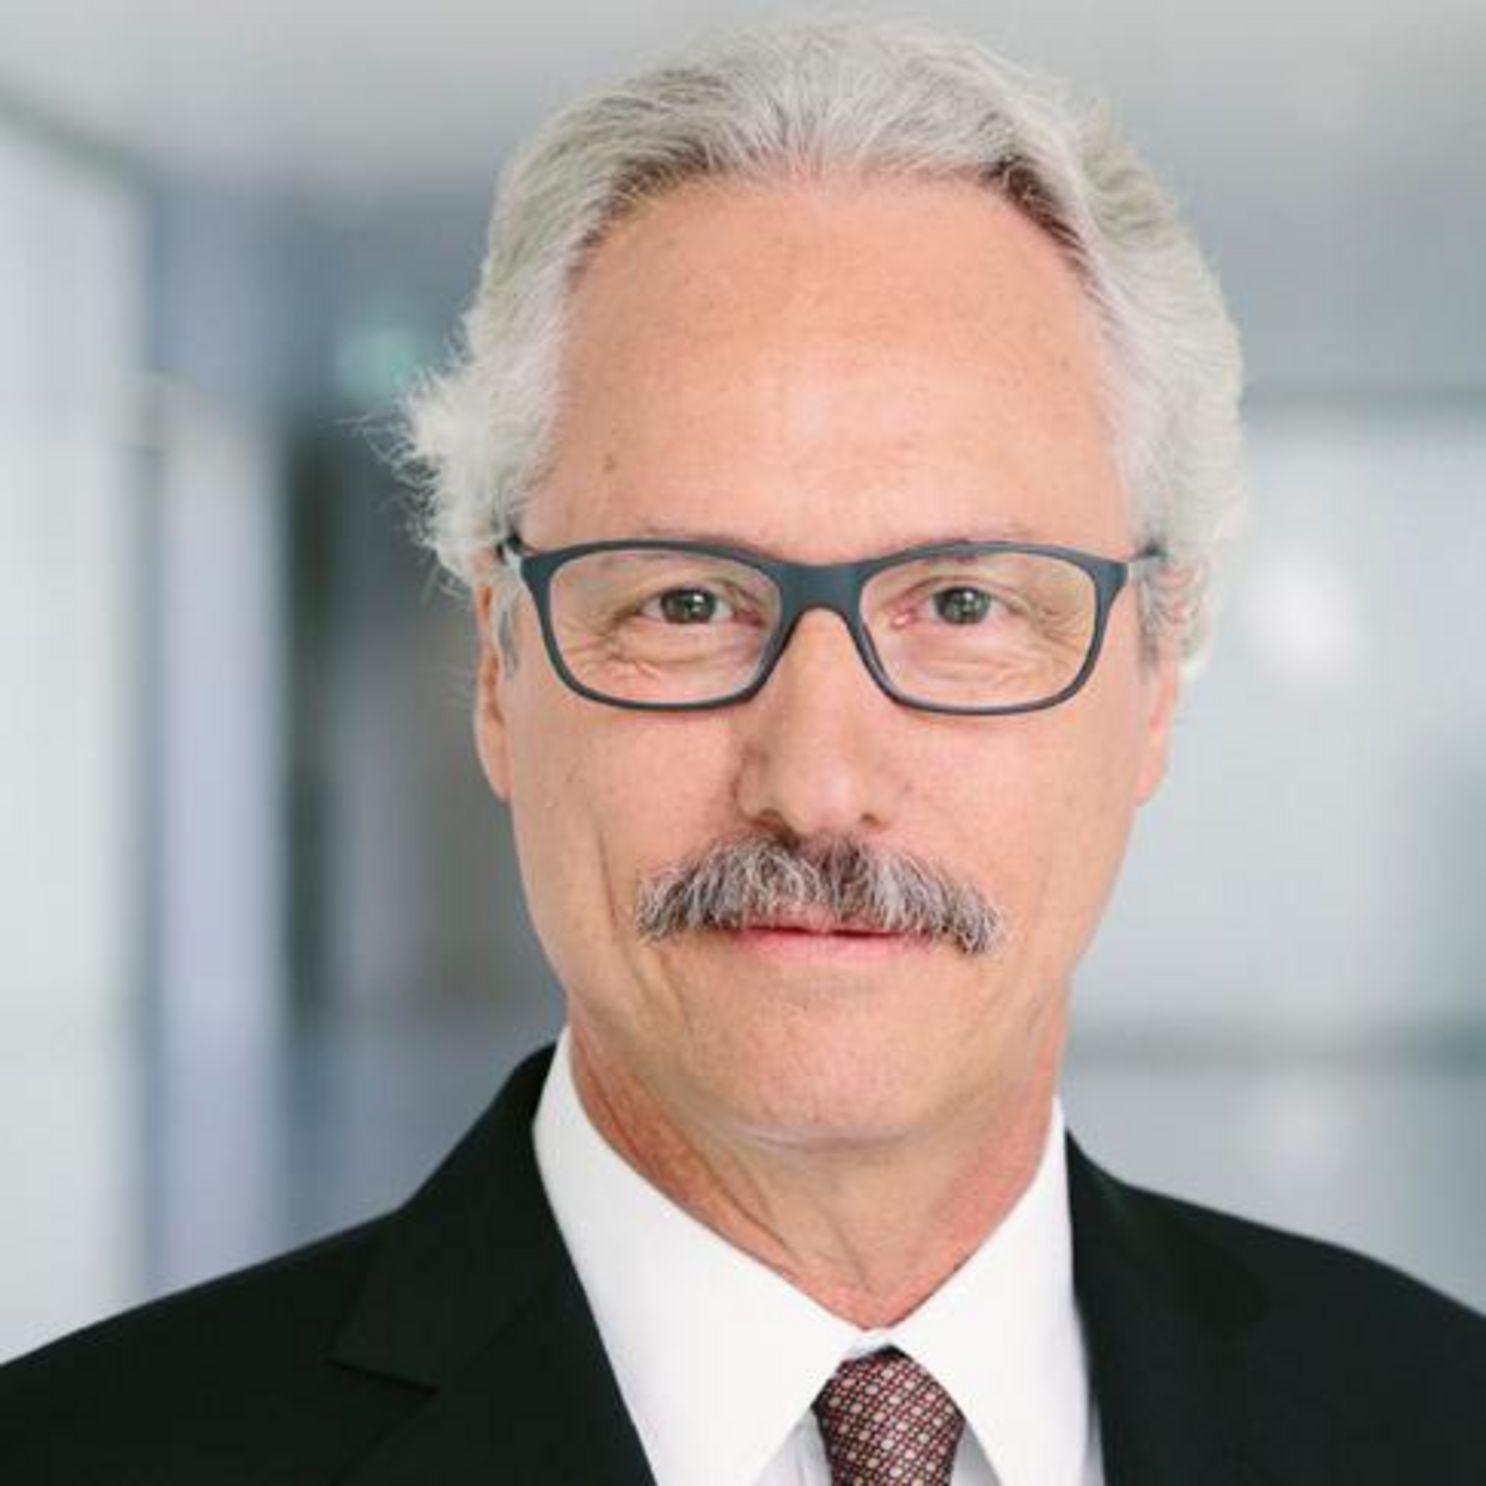 Gerhard Rübling, DGFP, Vorstandsvorsitzender, DGFP Kongress 2018